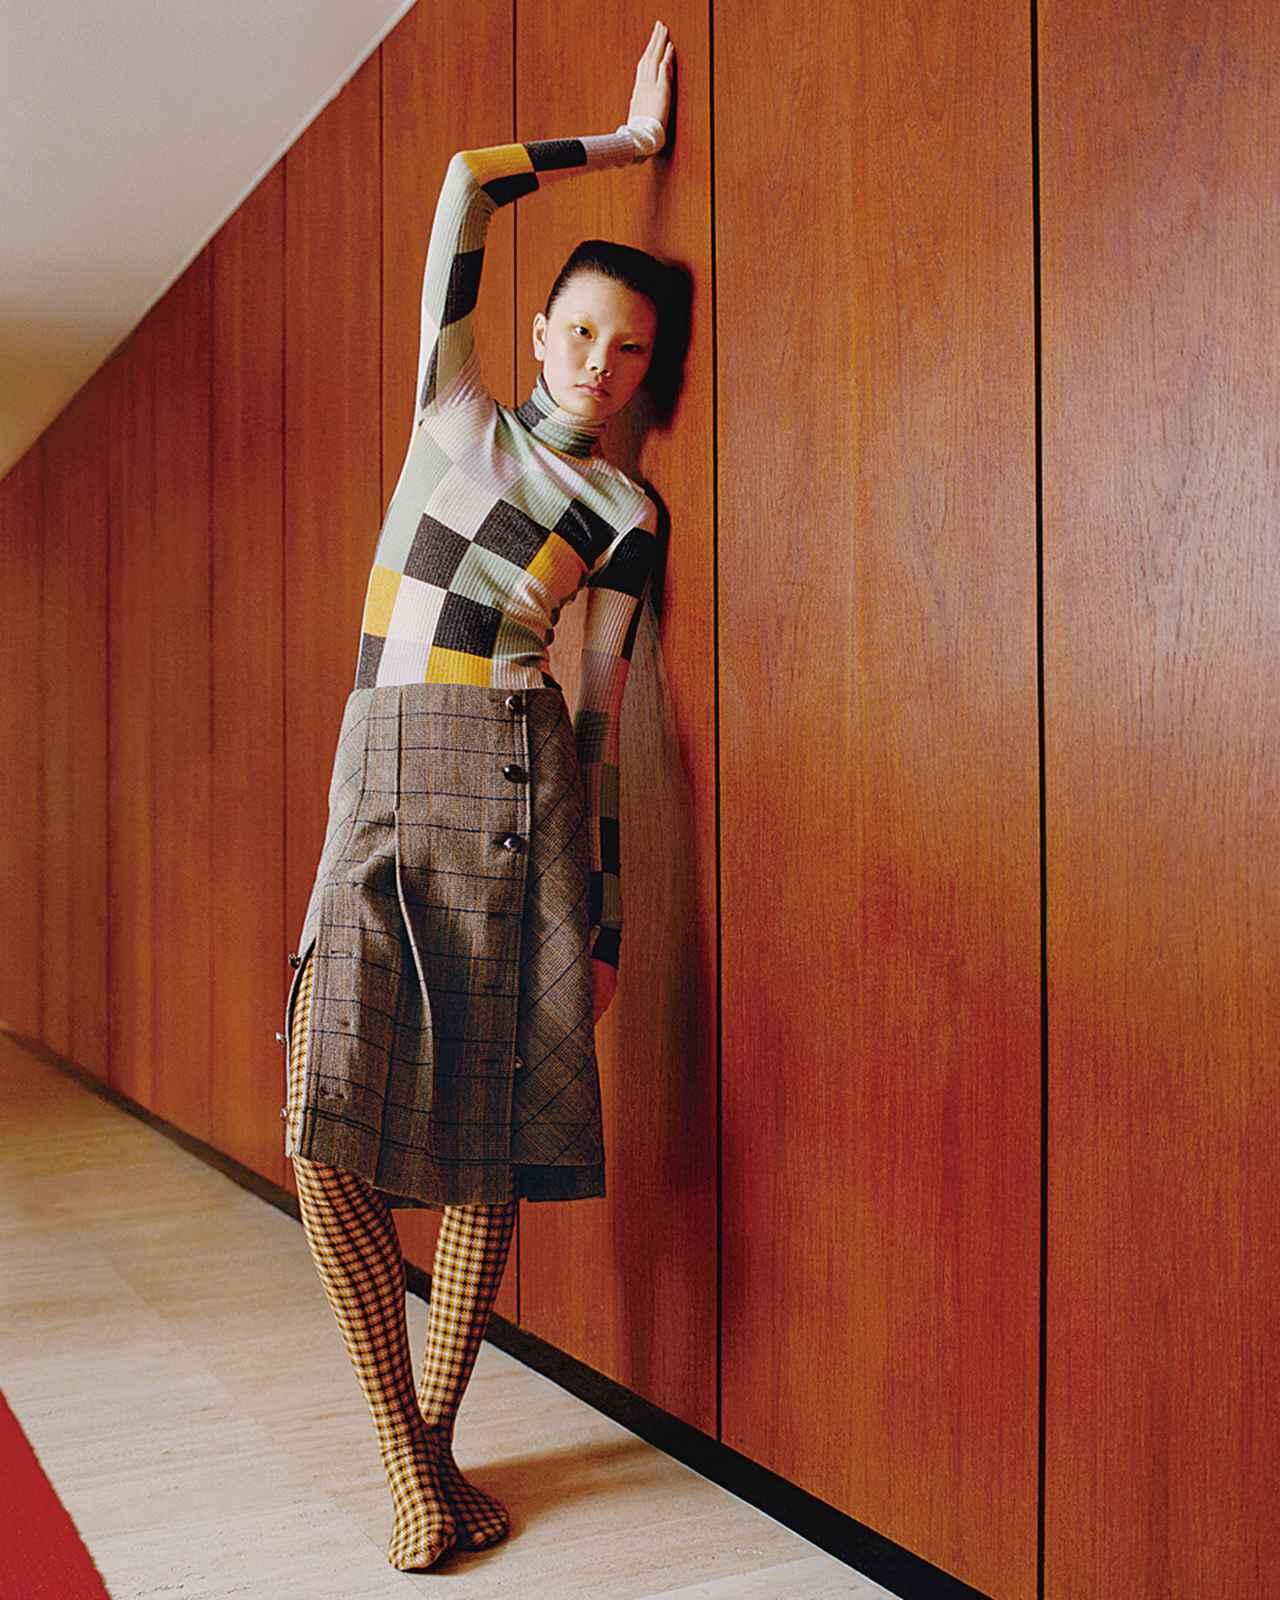 Images : 4番目の画像 - 「チェックは踊る―― プレイフルな冬のレイヤード」のアルバム - T JAPAN:The New York Times Style Magazine 公式サイト